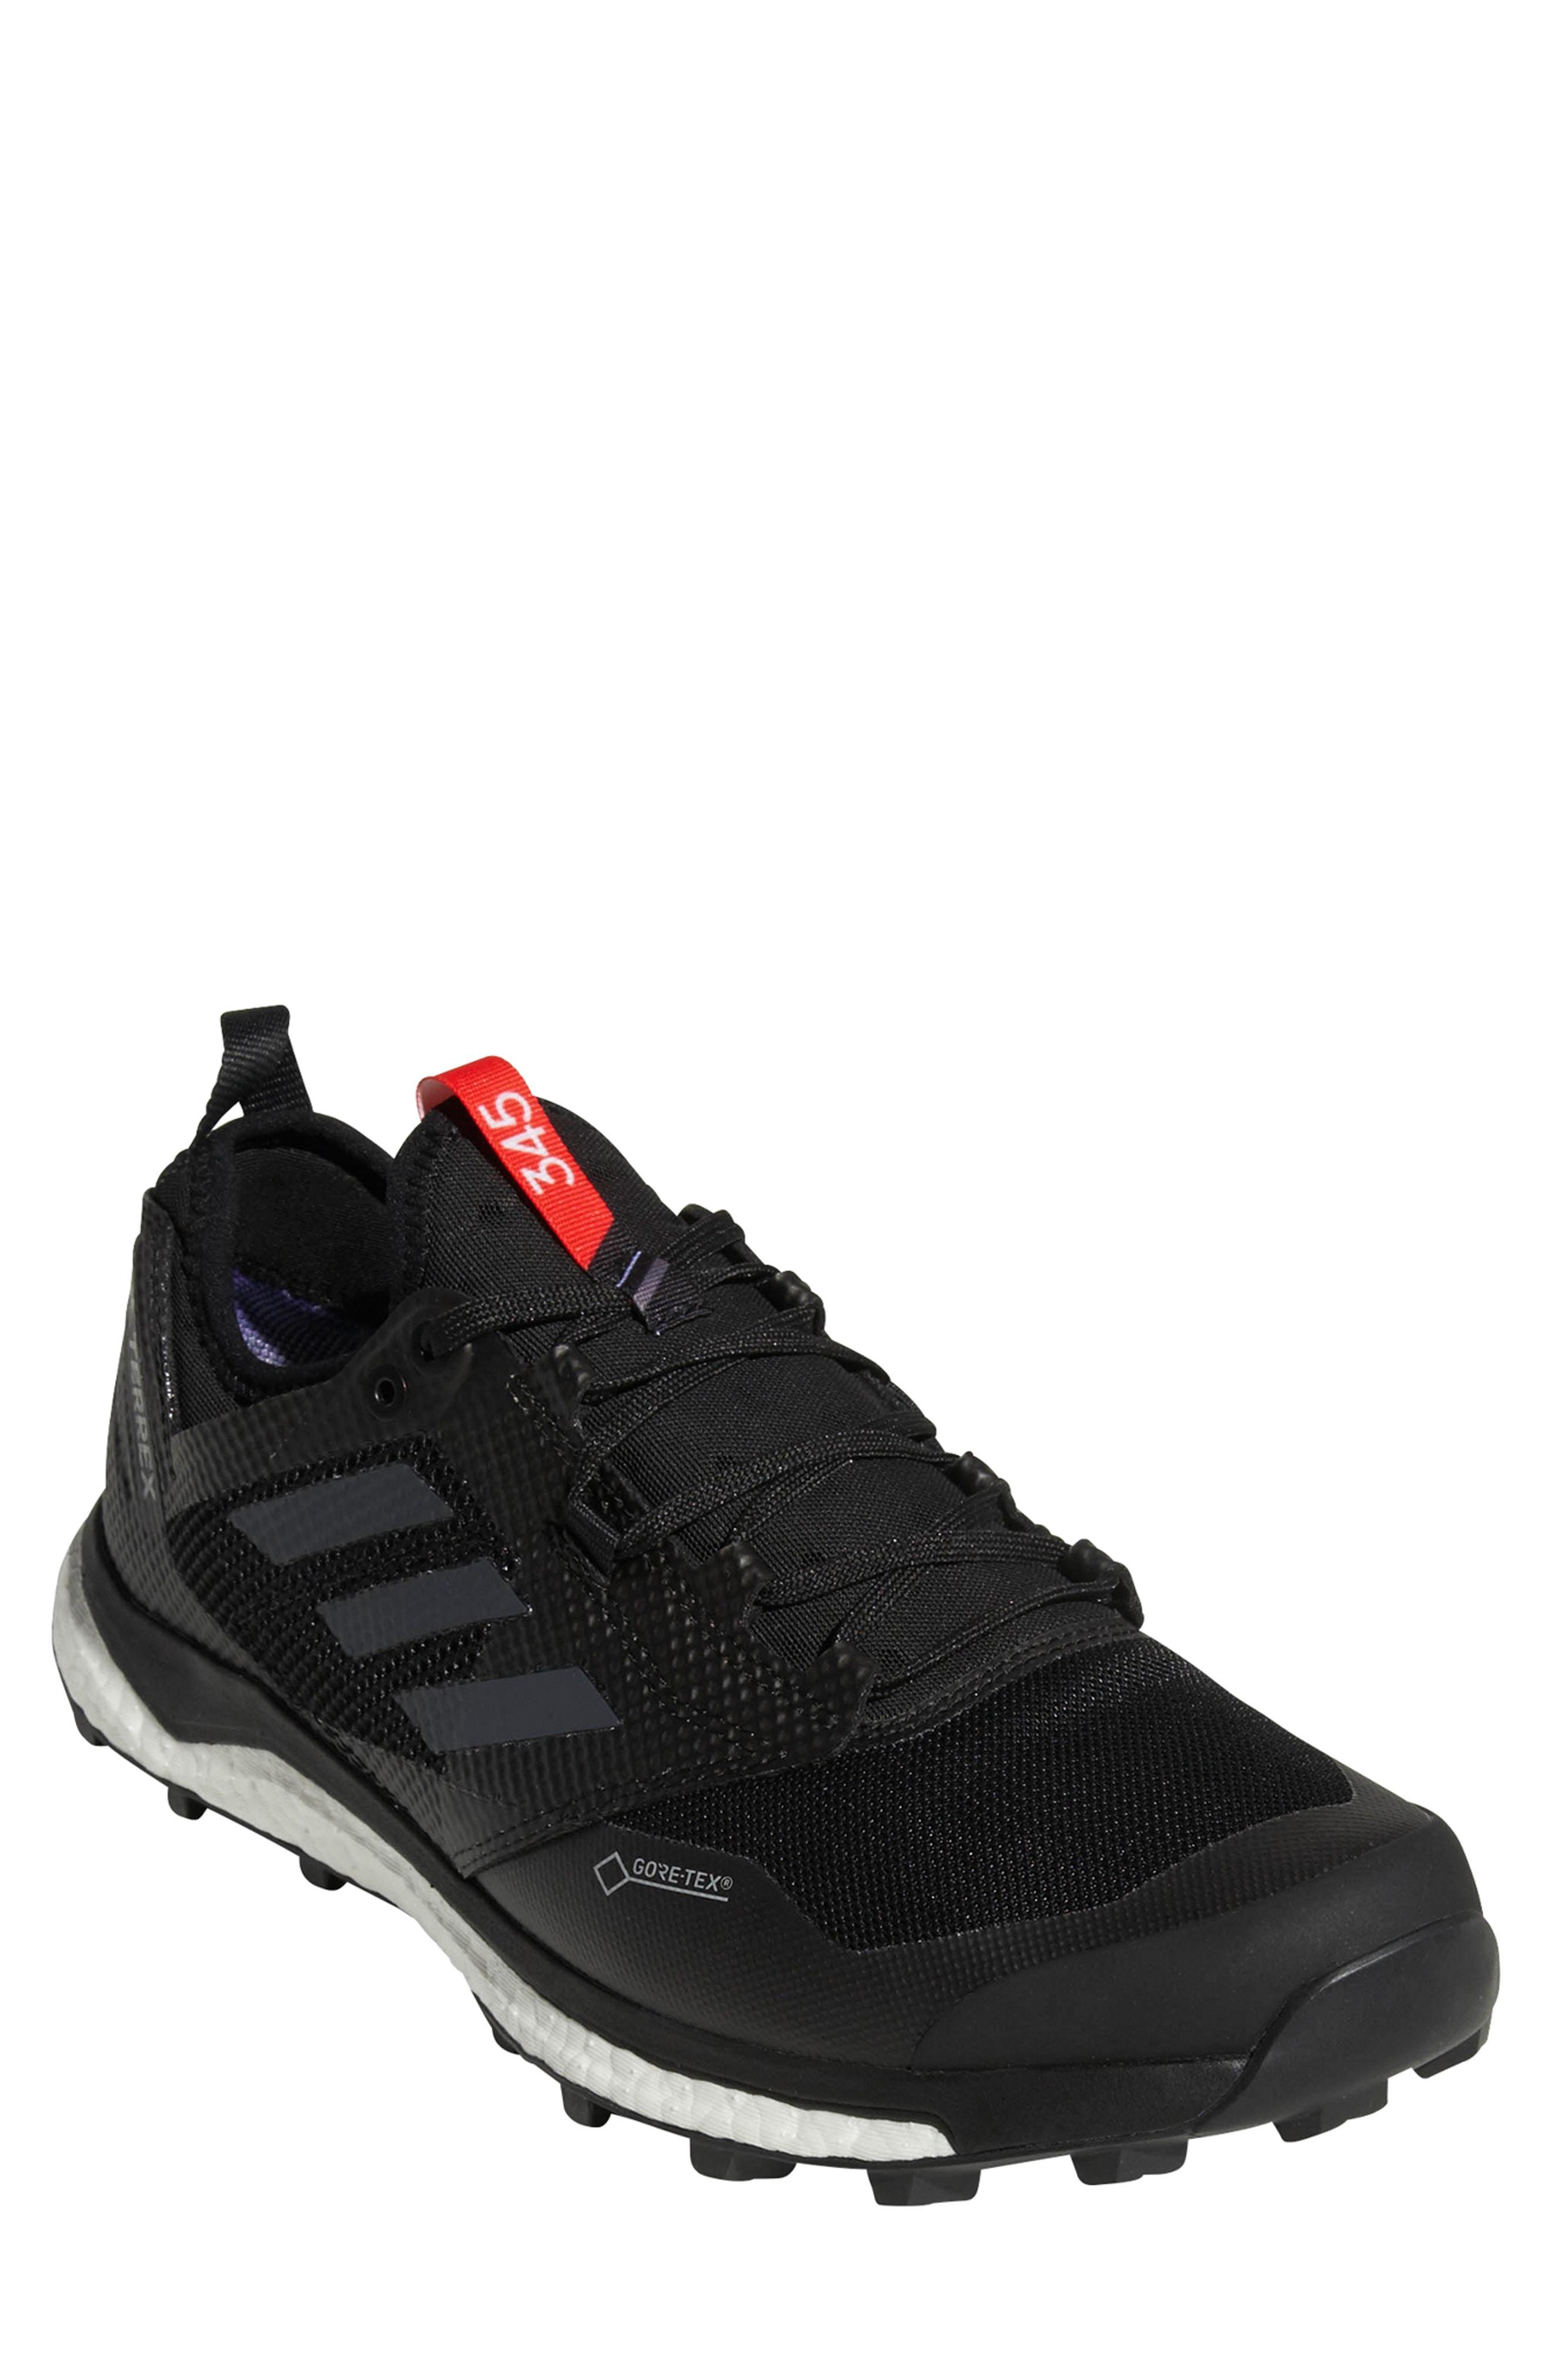 official photos 8dadb 7d50b adidas. Mens Black Terrex Agravic Xt Gore-tex Waterproof ...